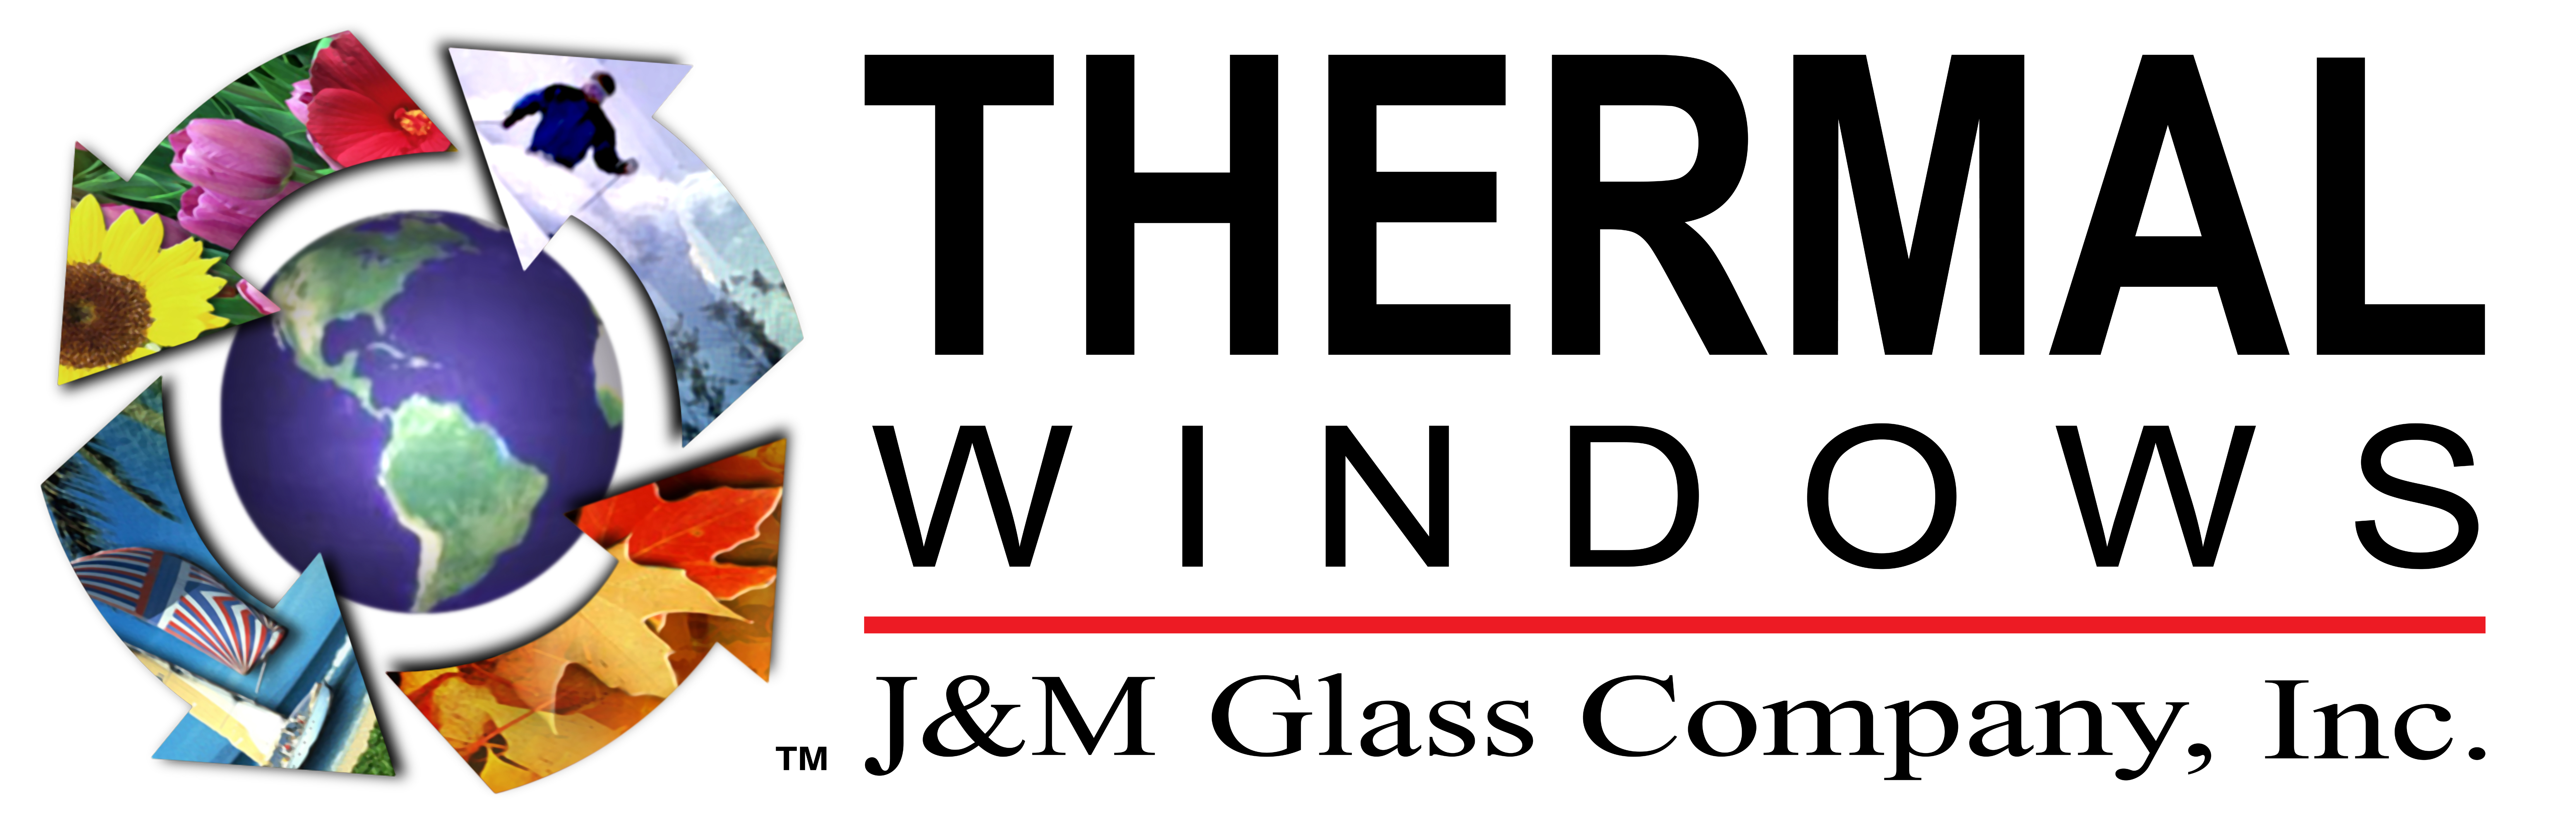 Tour of Homes - Thermal Windows|J&M Glass logo